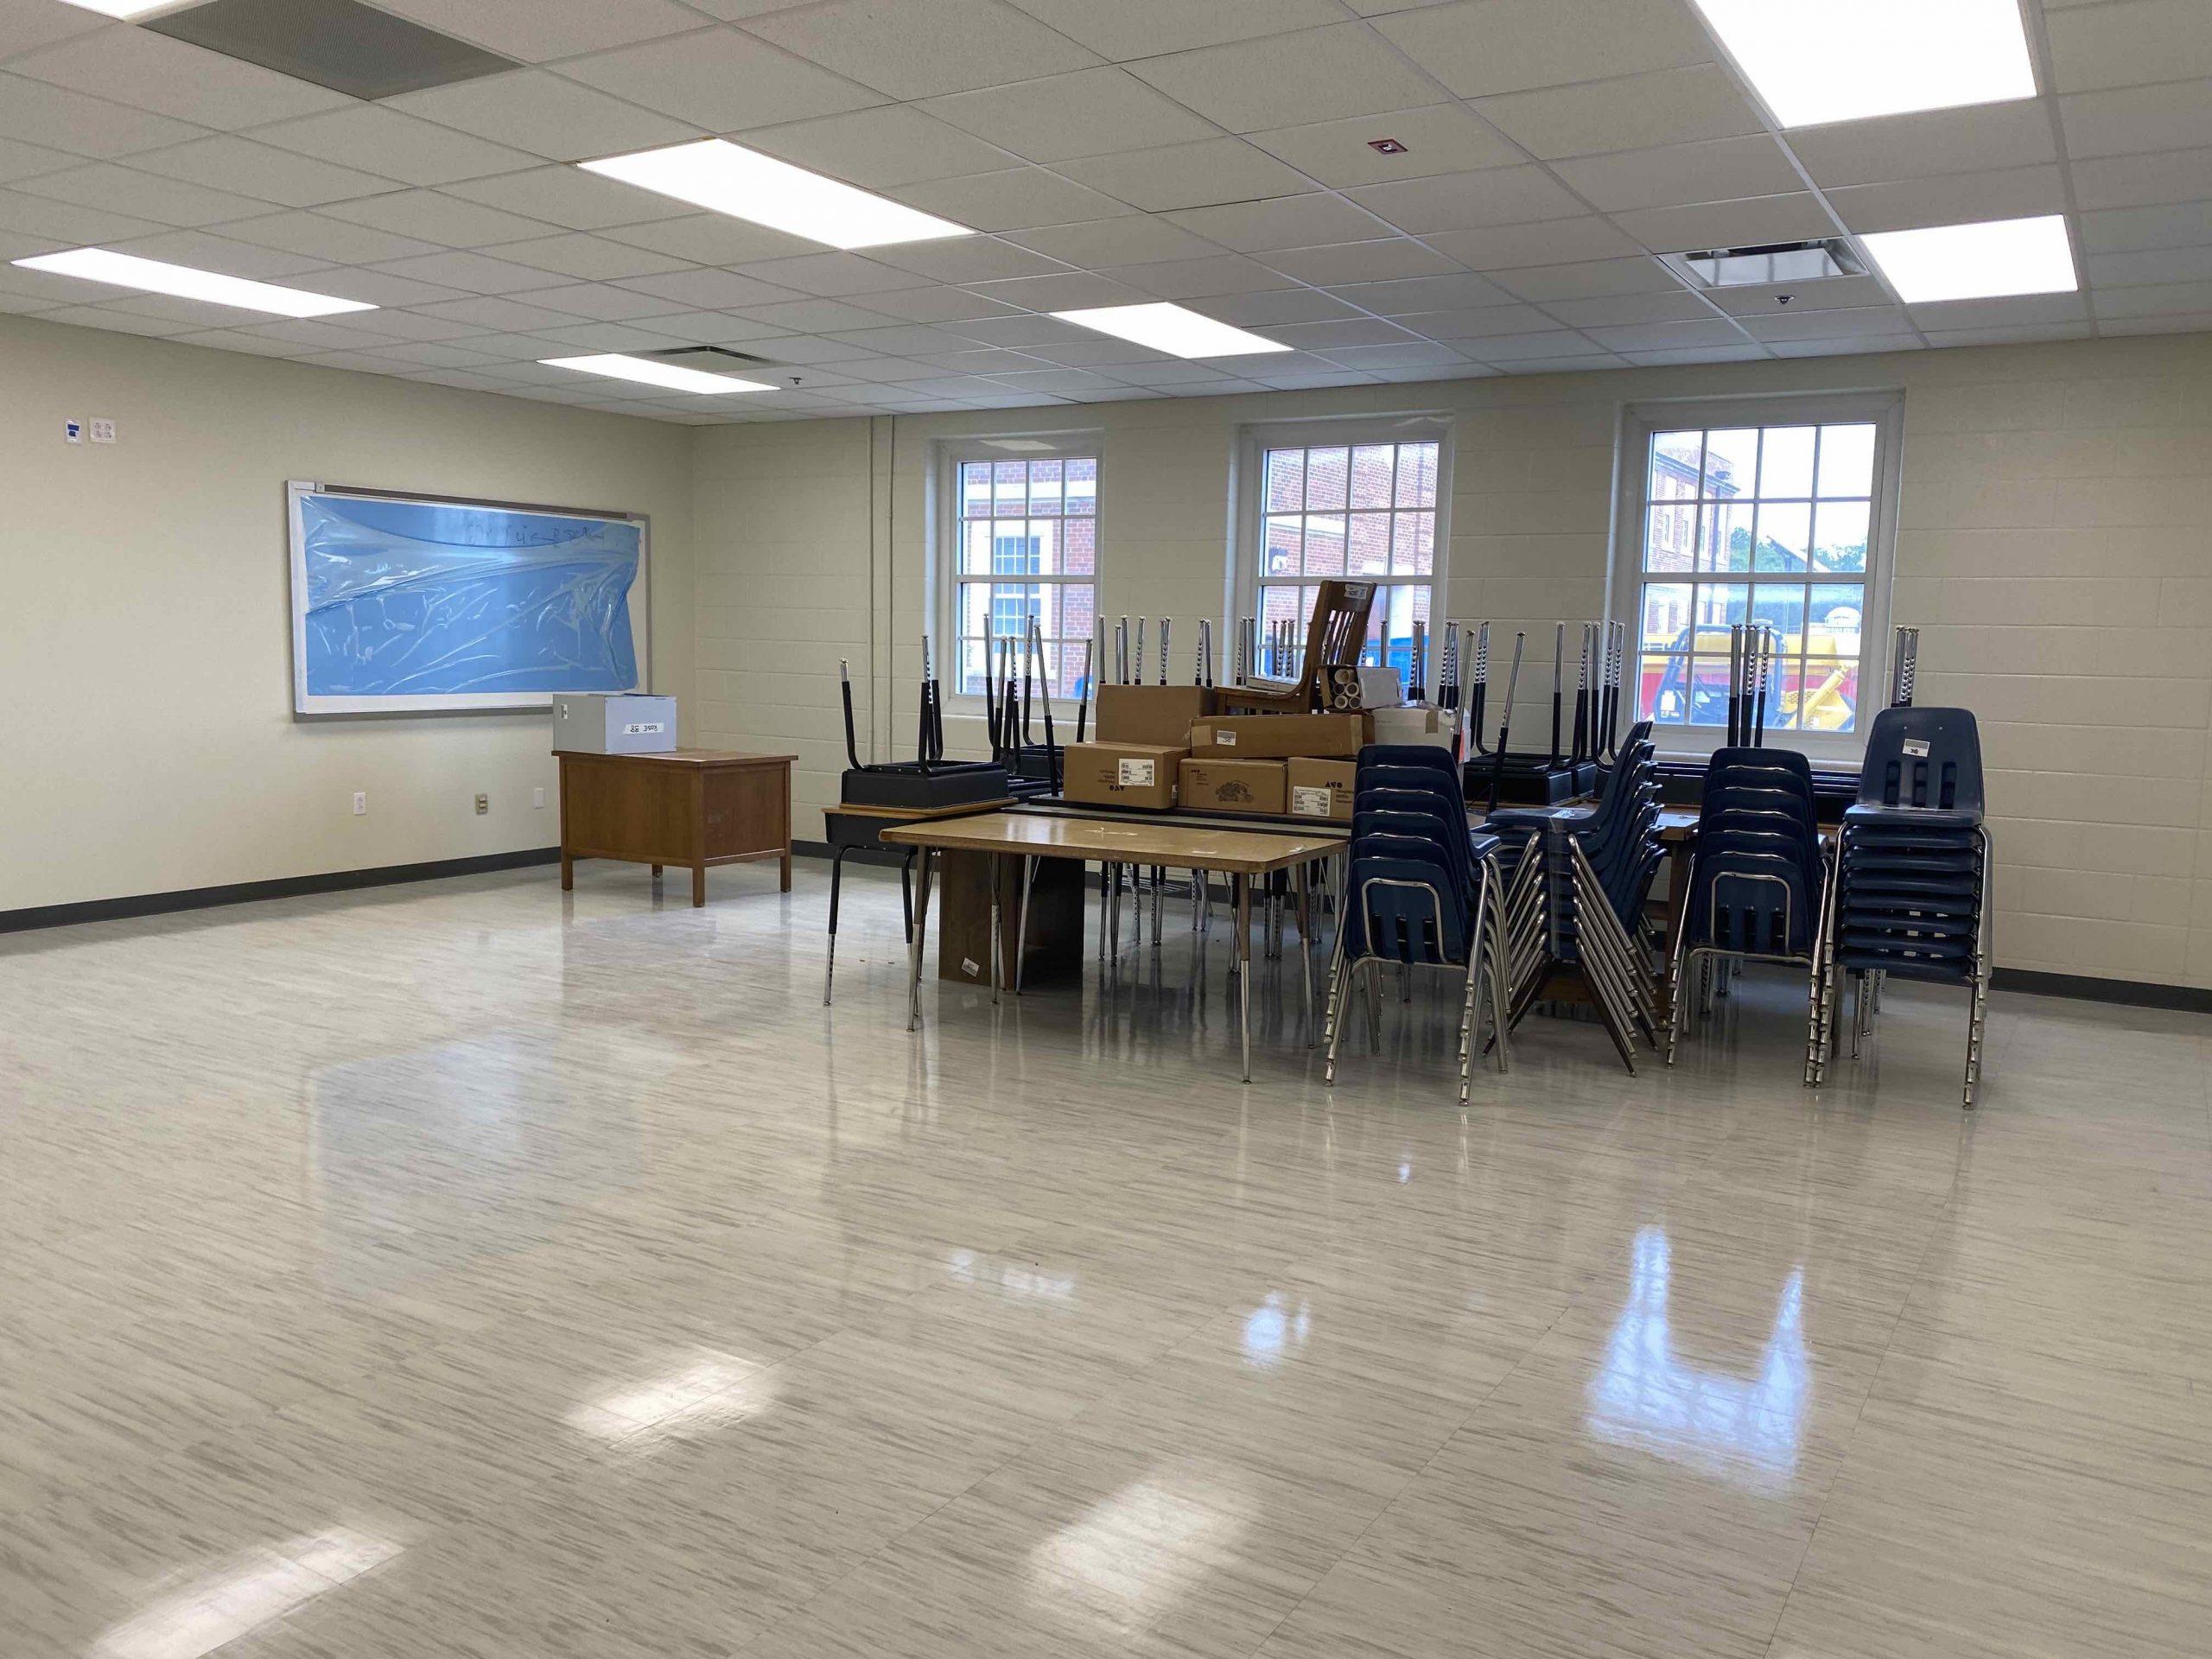 B4 Area Classrooms image 1